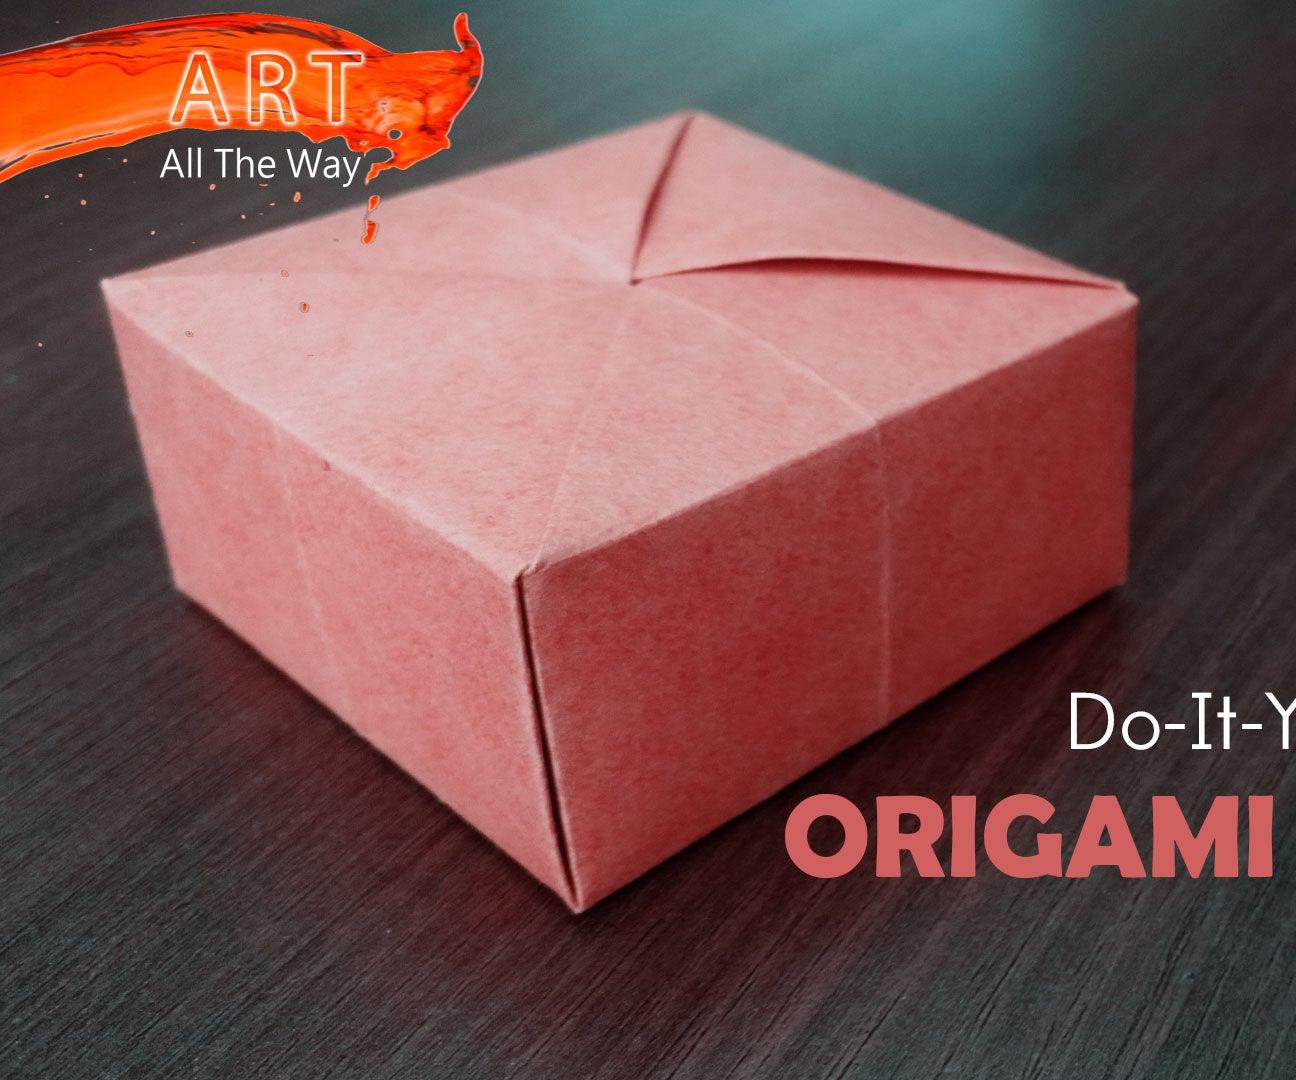 Wondrous One Sheet Origami: Amazon.de: Mukerji, Meenakshi ... | 1080x1296